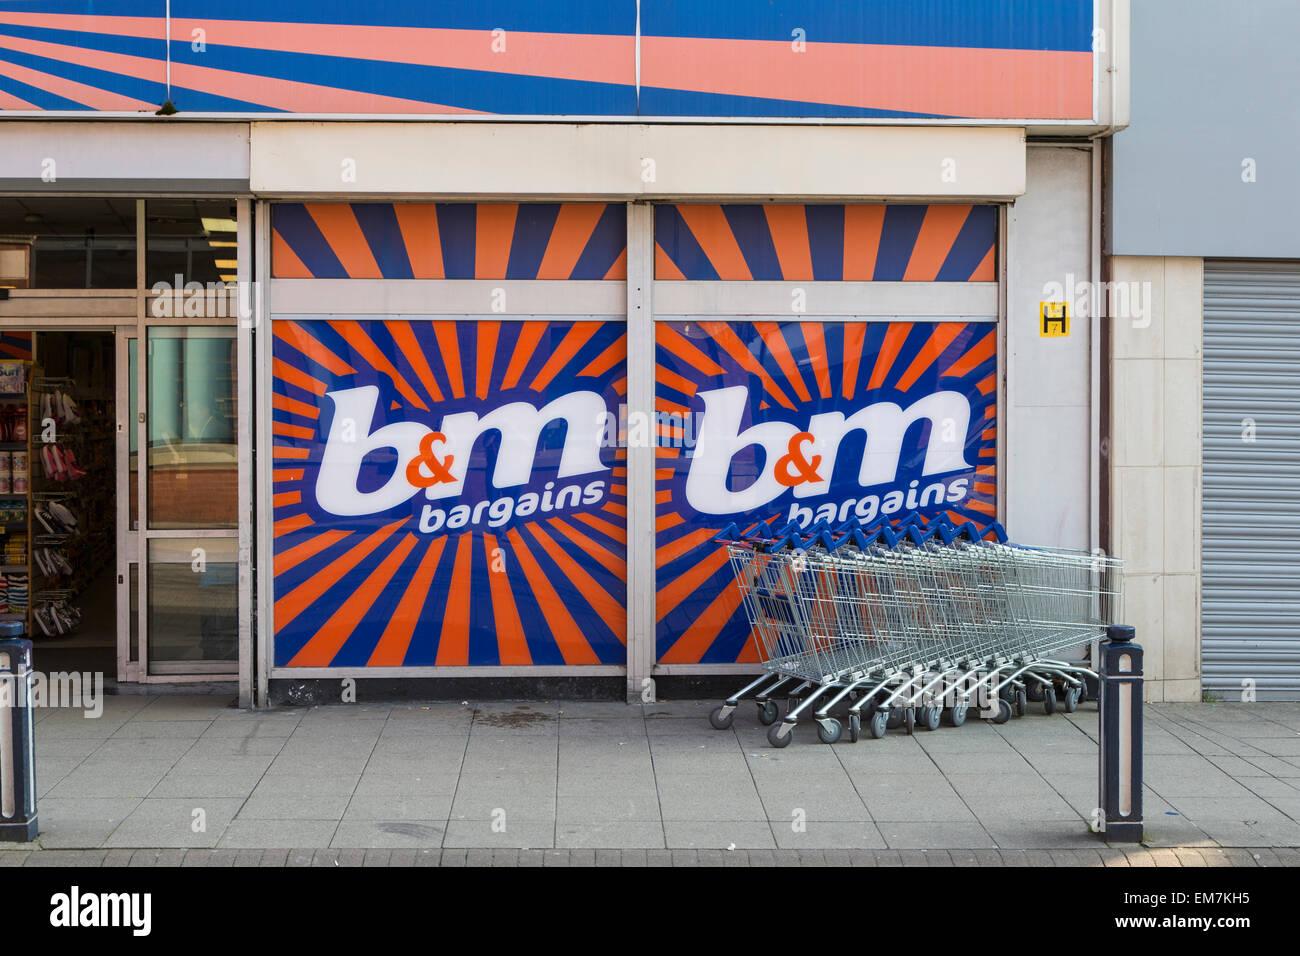 B and M B&M Bargain store, Ashton-under-Lyne, Lancashire, UK - Stock Image